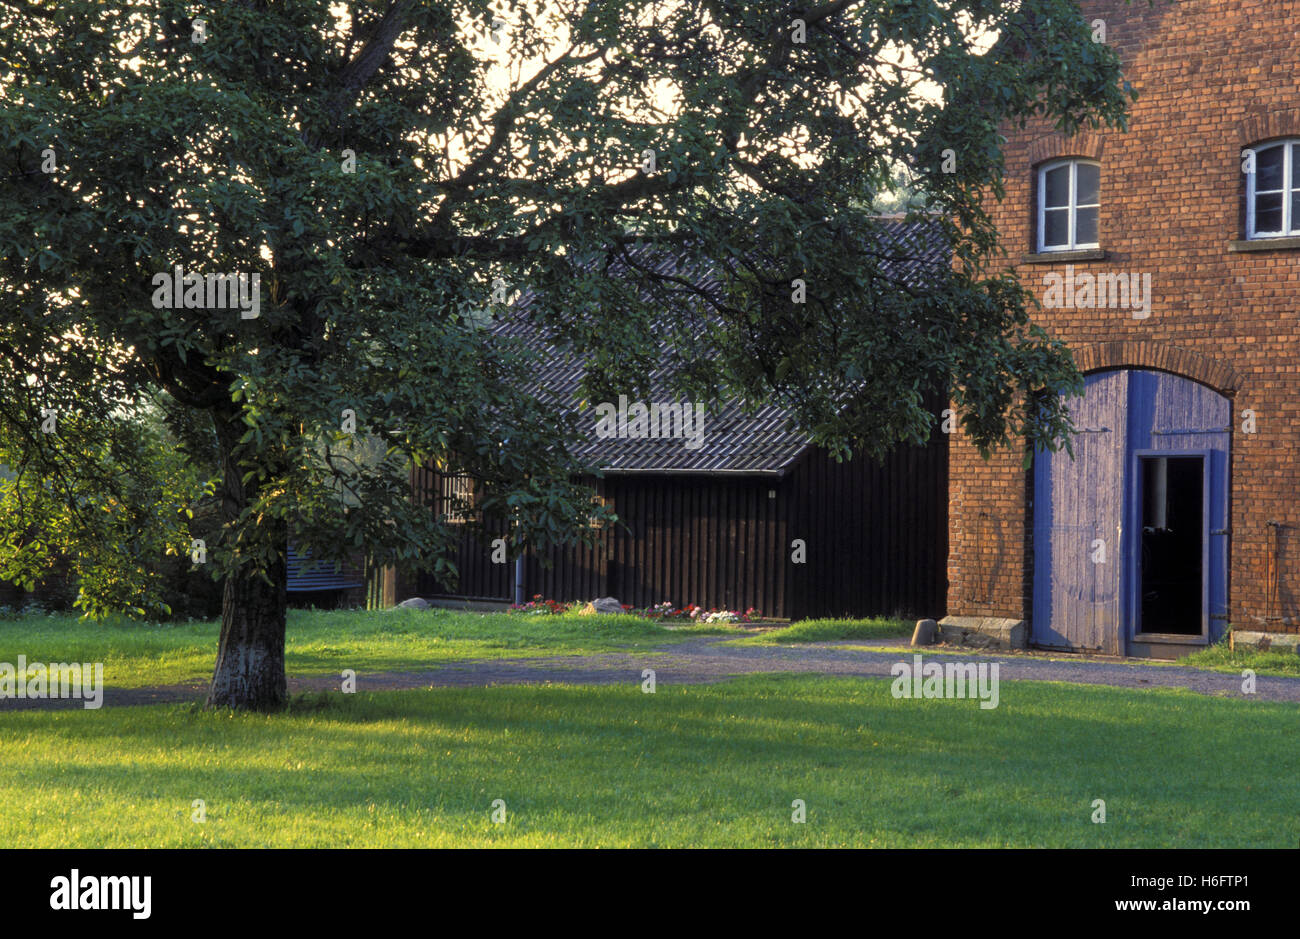 Germany, Lower Saxony, farmhouse near Rinteln - Stock Image